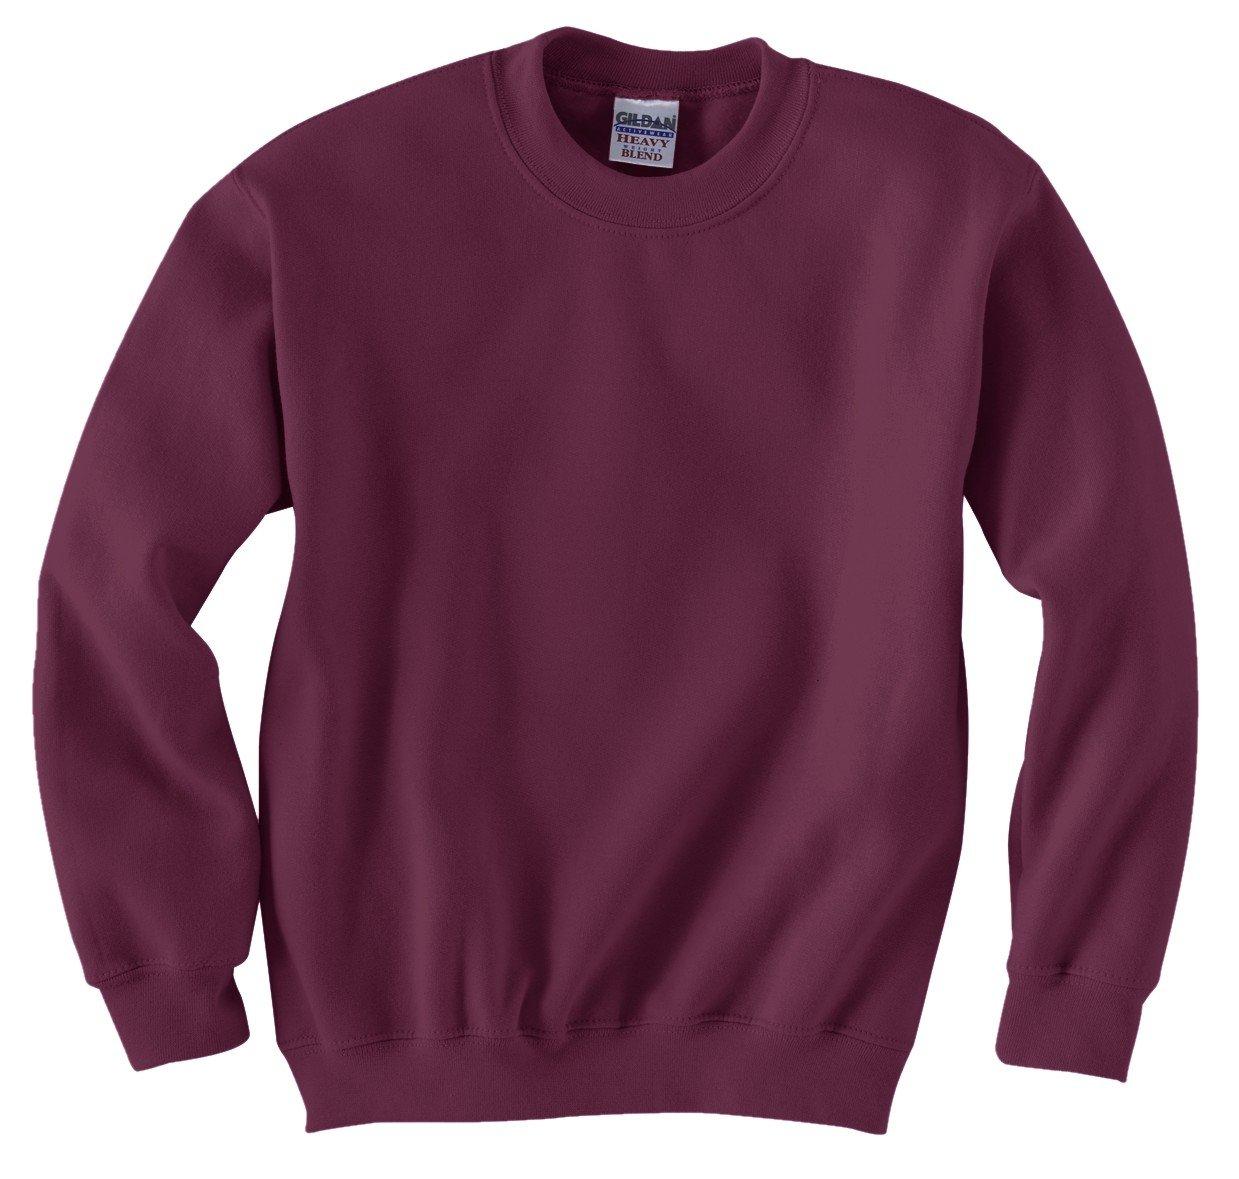 Gildan Heavy BlendTM Youth 8 oz., 50/50 Fleece Crewneck Sweatshirt 18000B